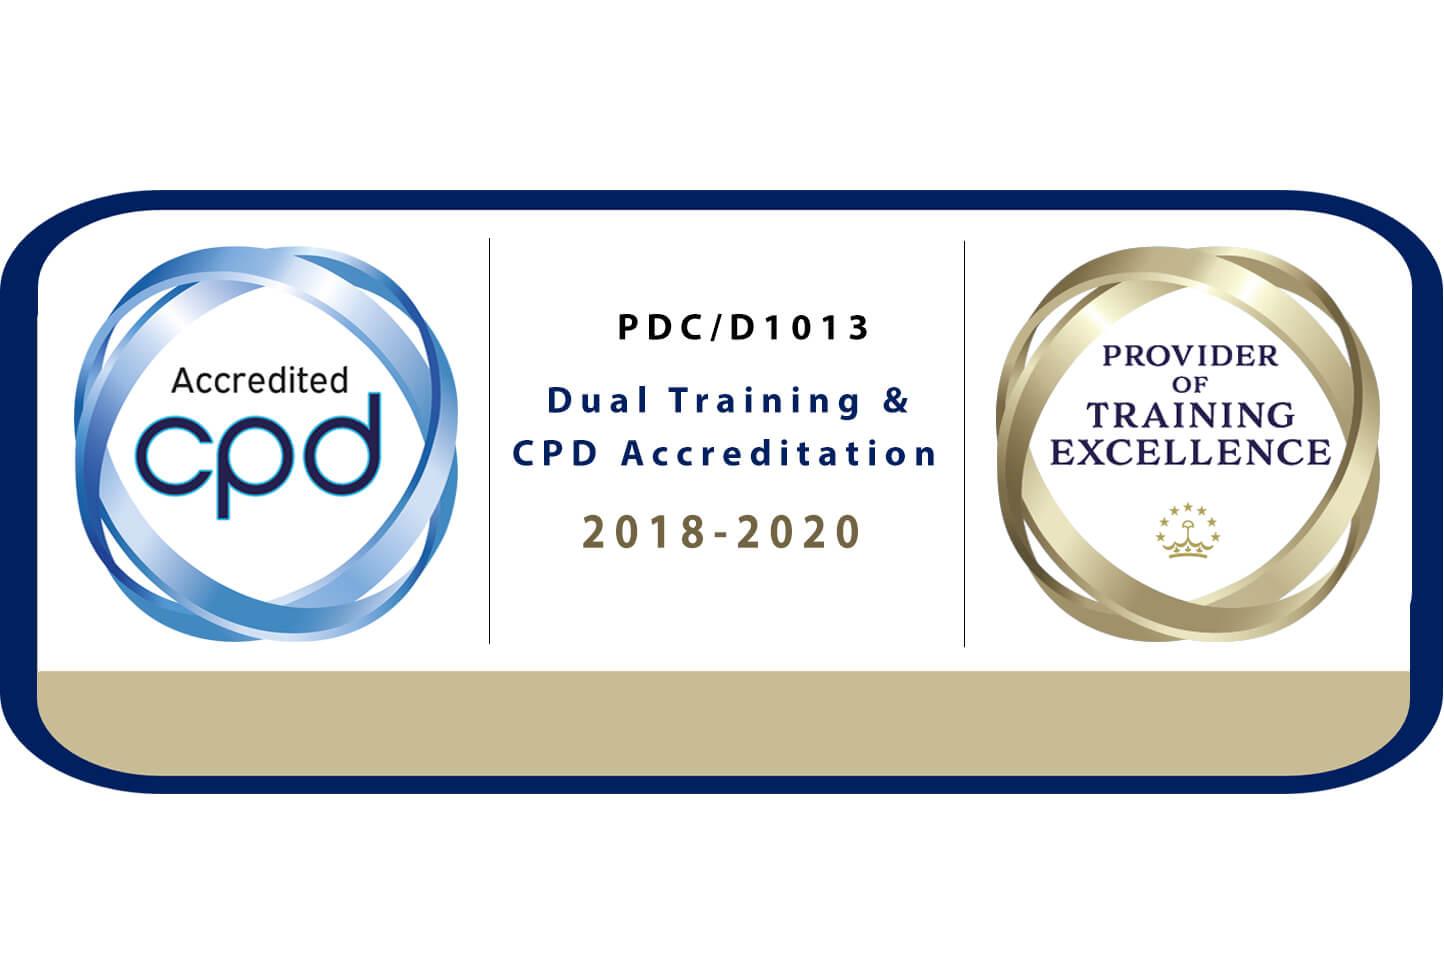 Dual Accreditation Provider Logo GTC PDCD1013(1) (1)